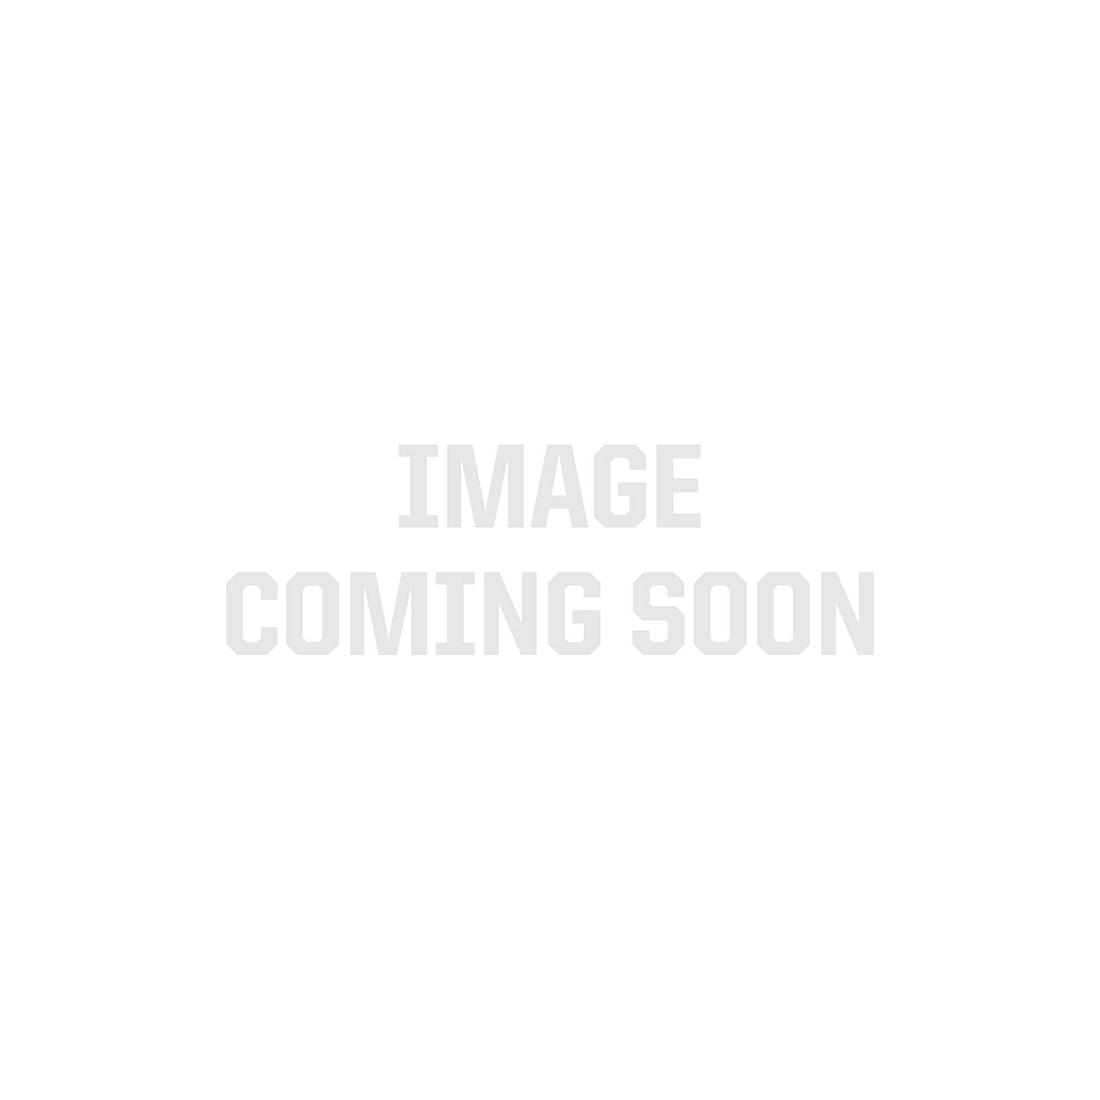 Waterproof Amber 3014 Side View LED Strip Light, 96/m, 8mm wide, Sample Kit